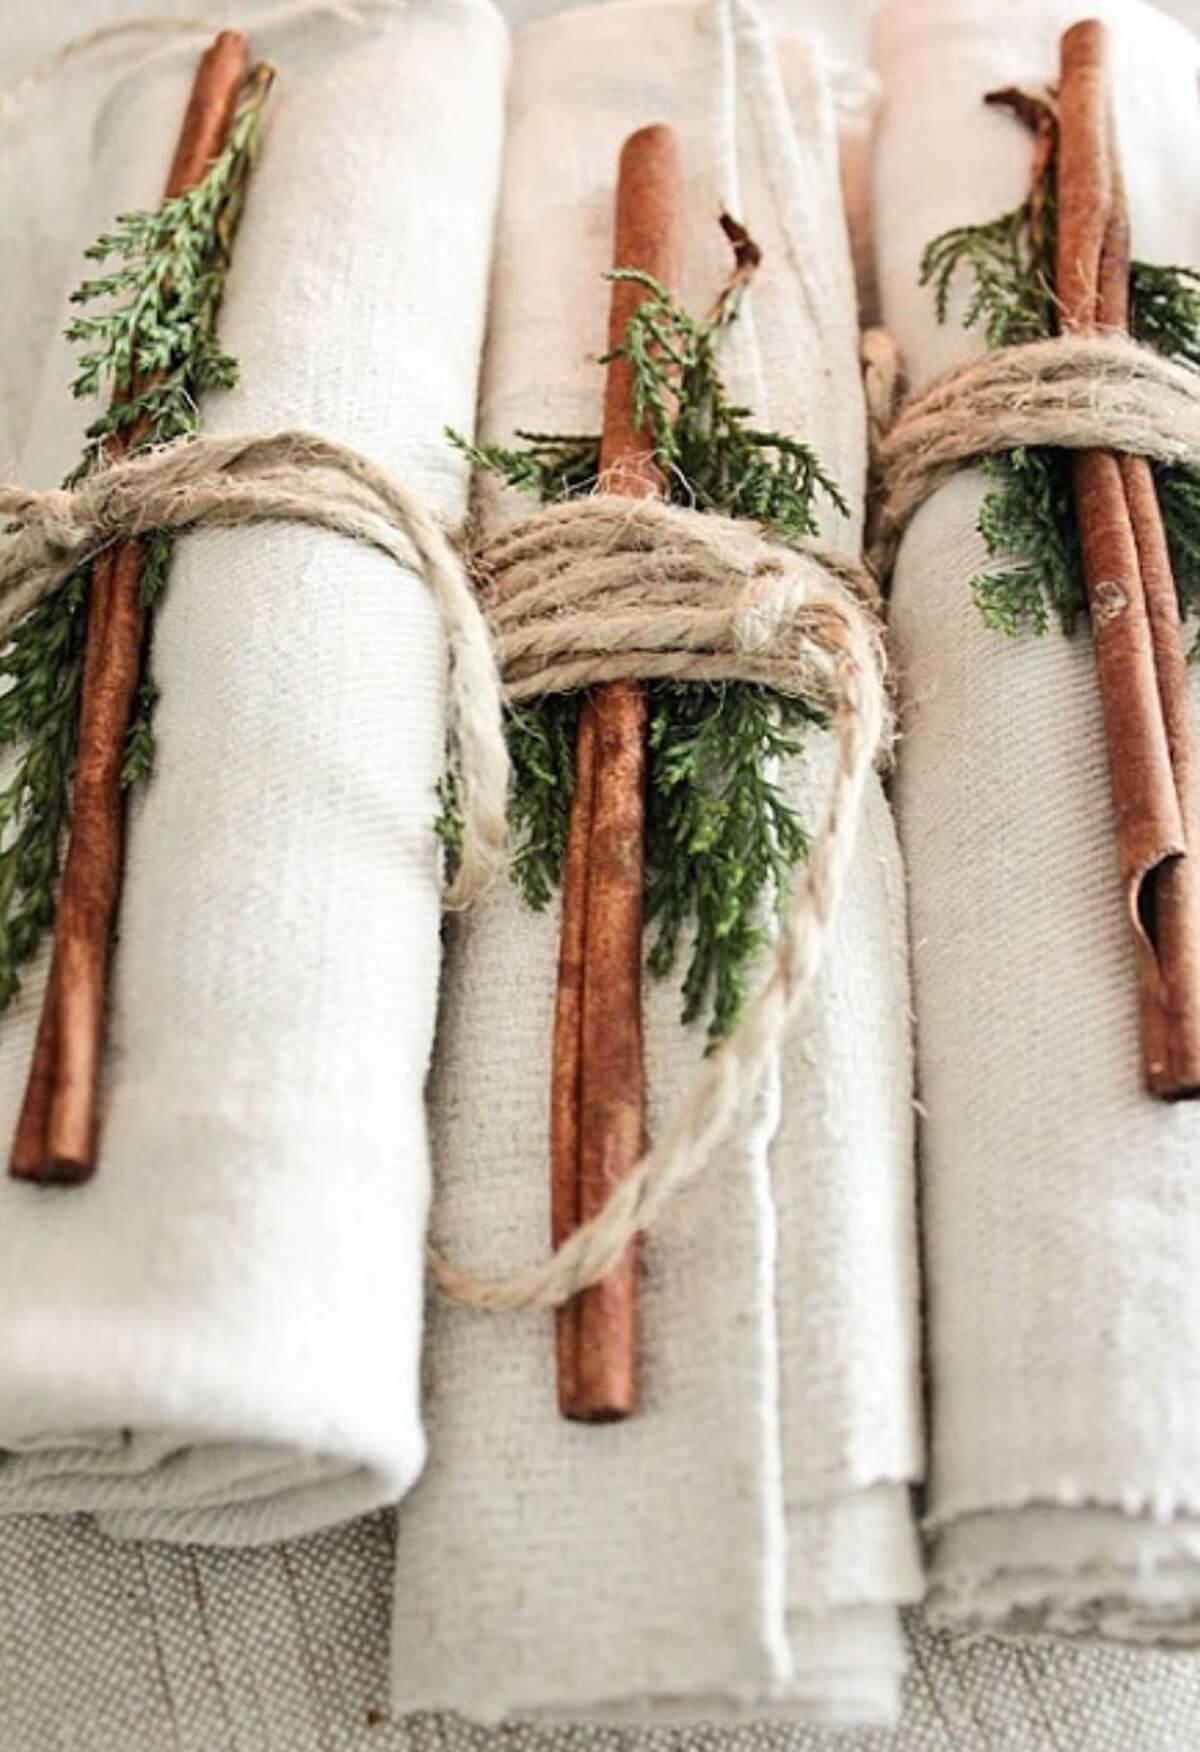 Scents of the Season Linen Wraps